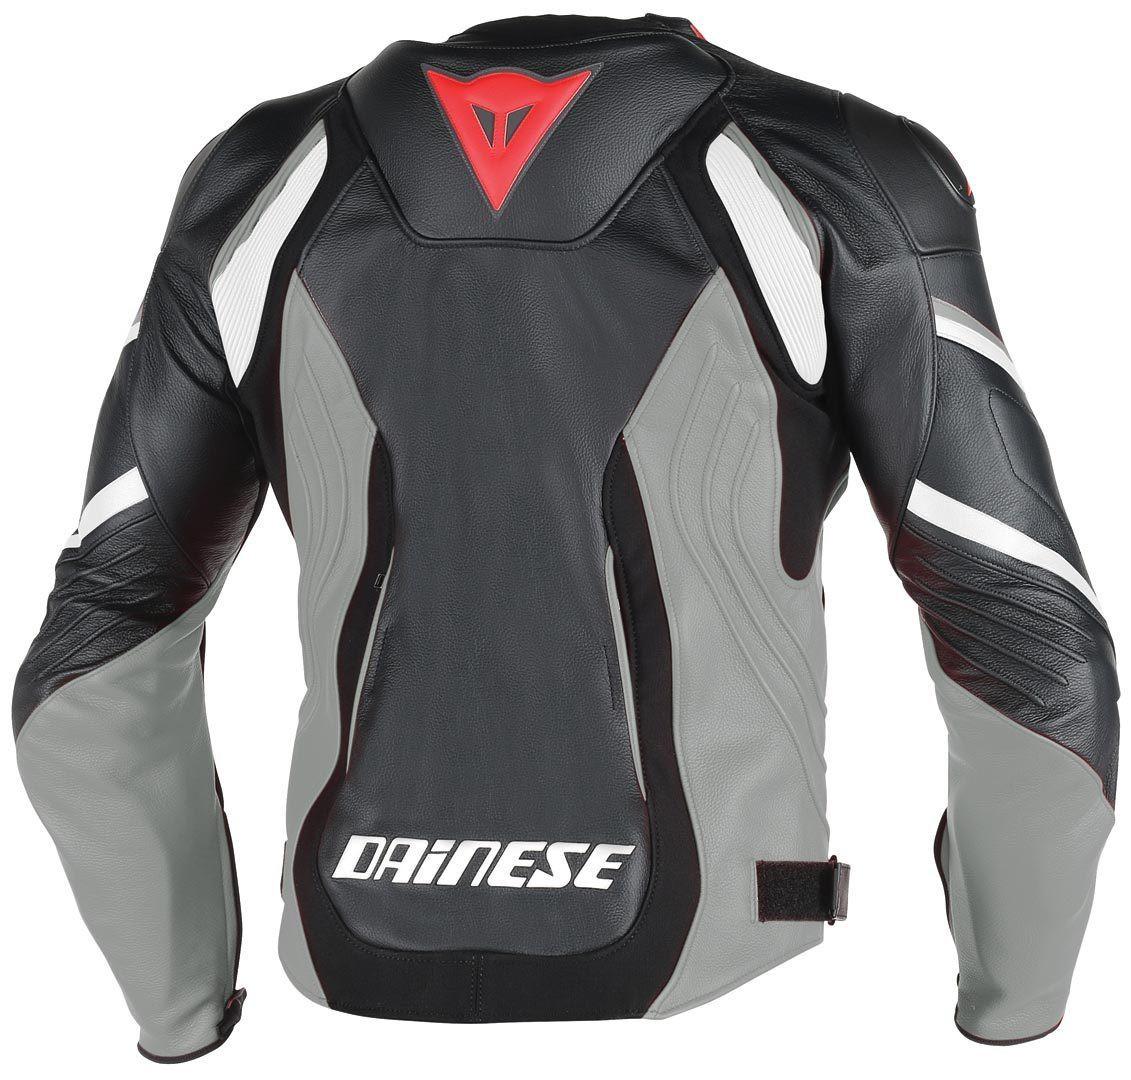 giacche dainese pelle, Dainese super speed d1 giubbotto moto